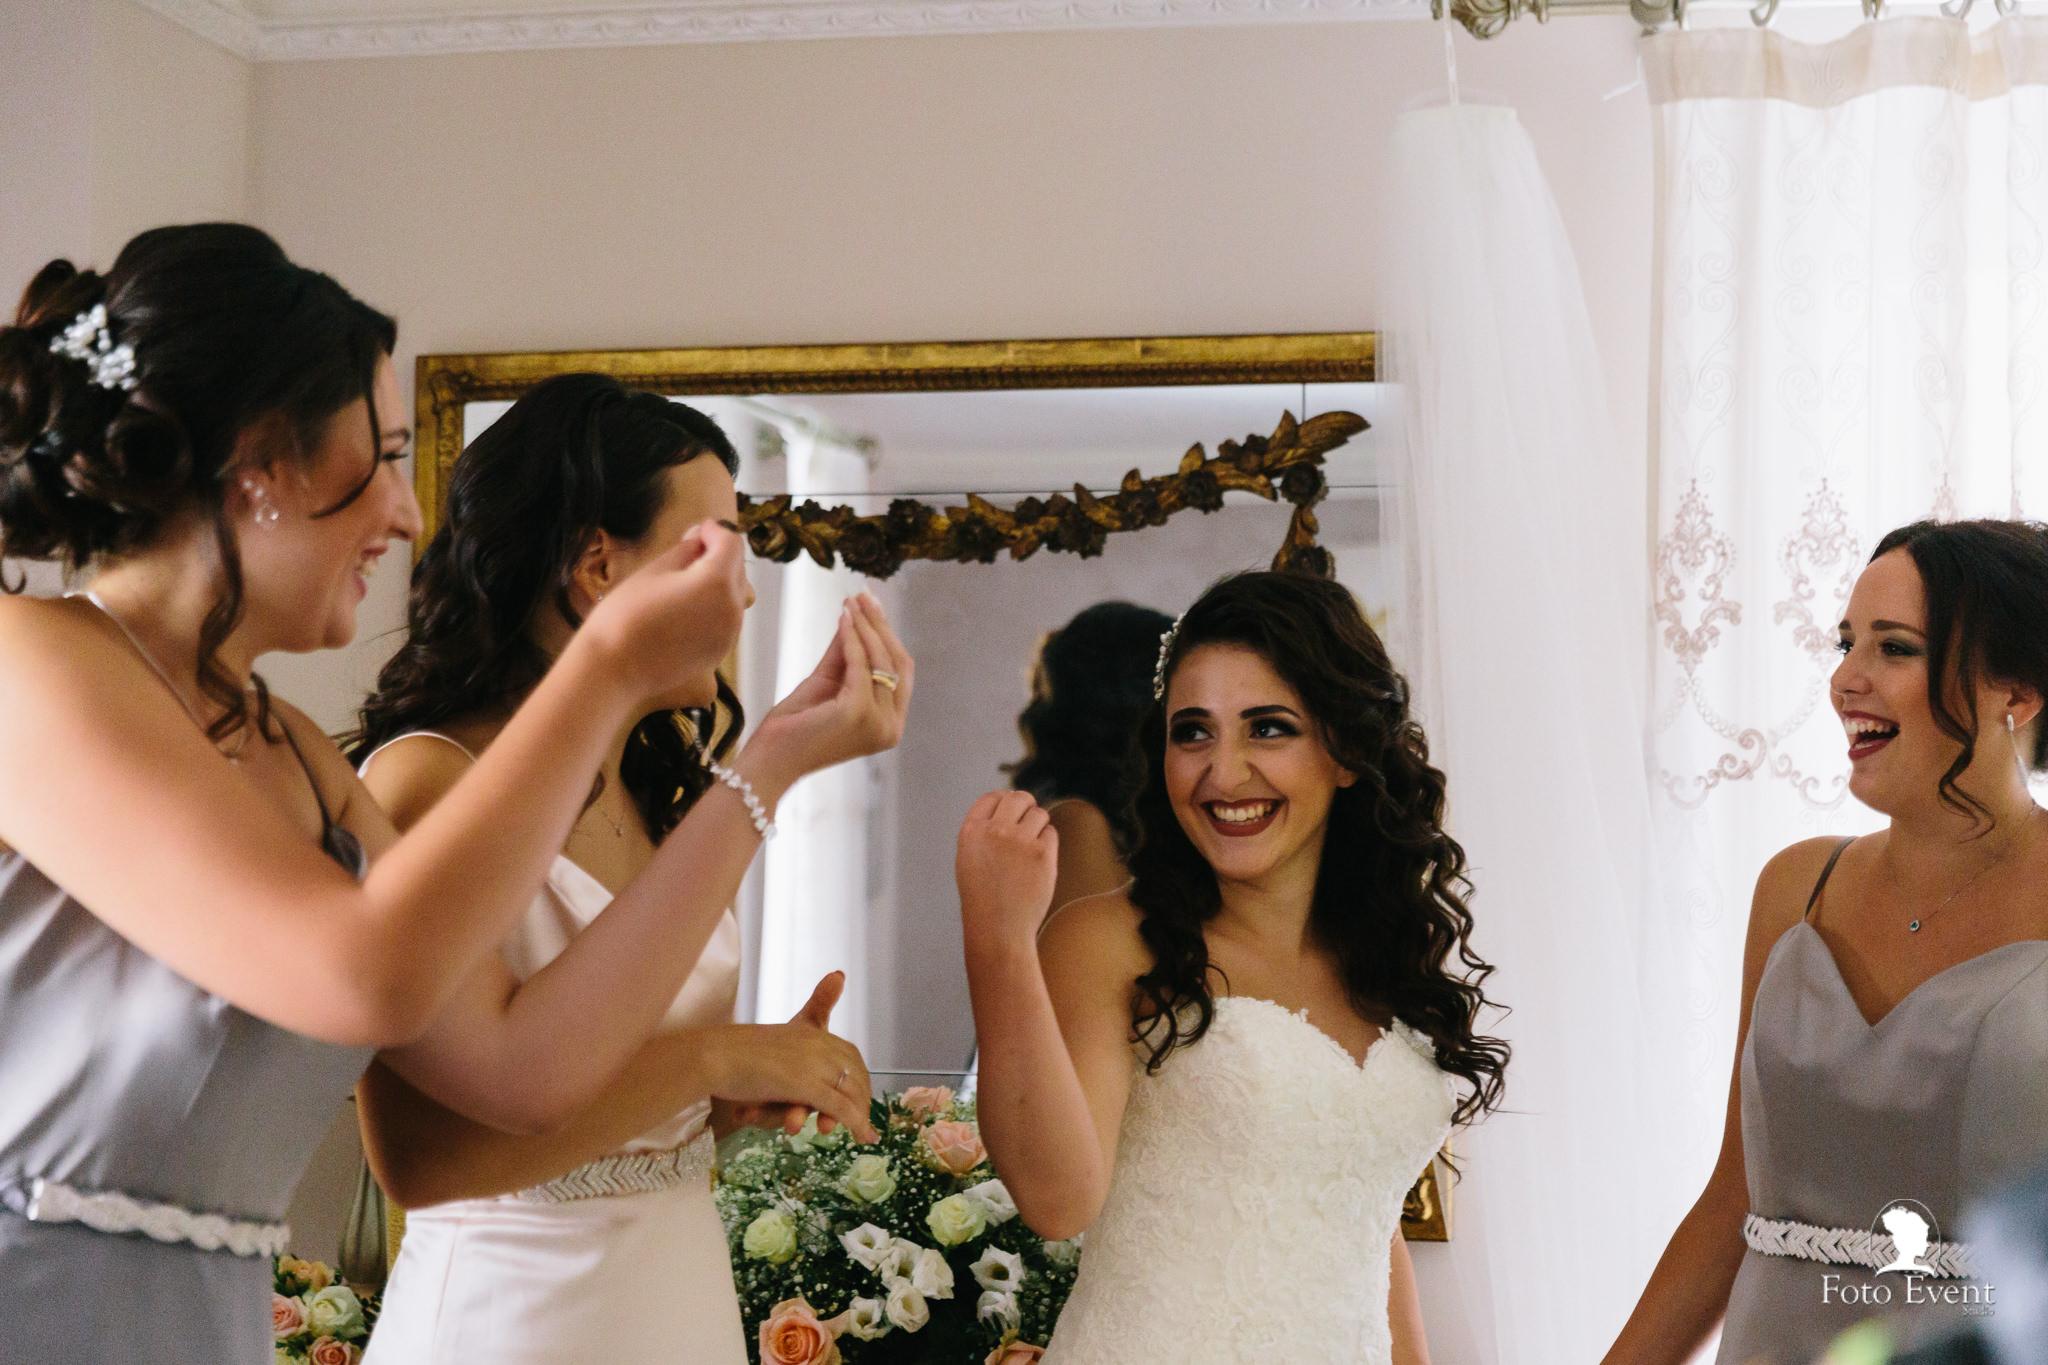 017-2019-08-31-Matrimonio-Serena-e-Saverio-Tarantino-5DE-438